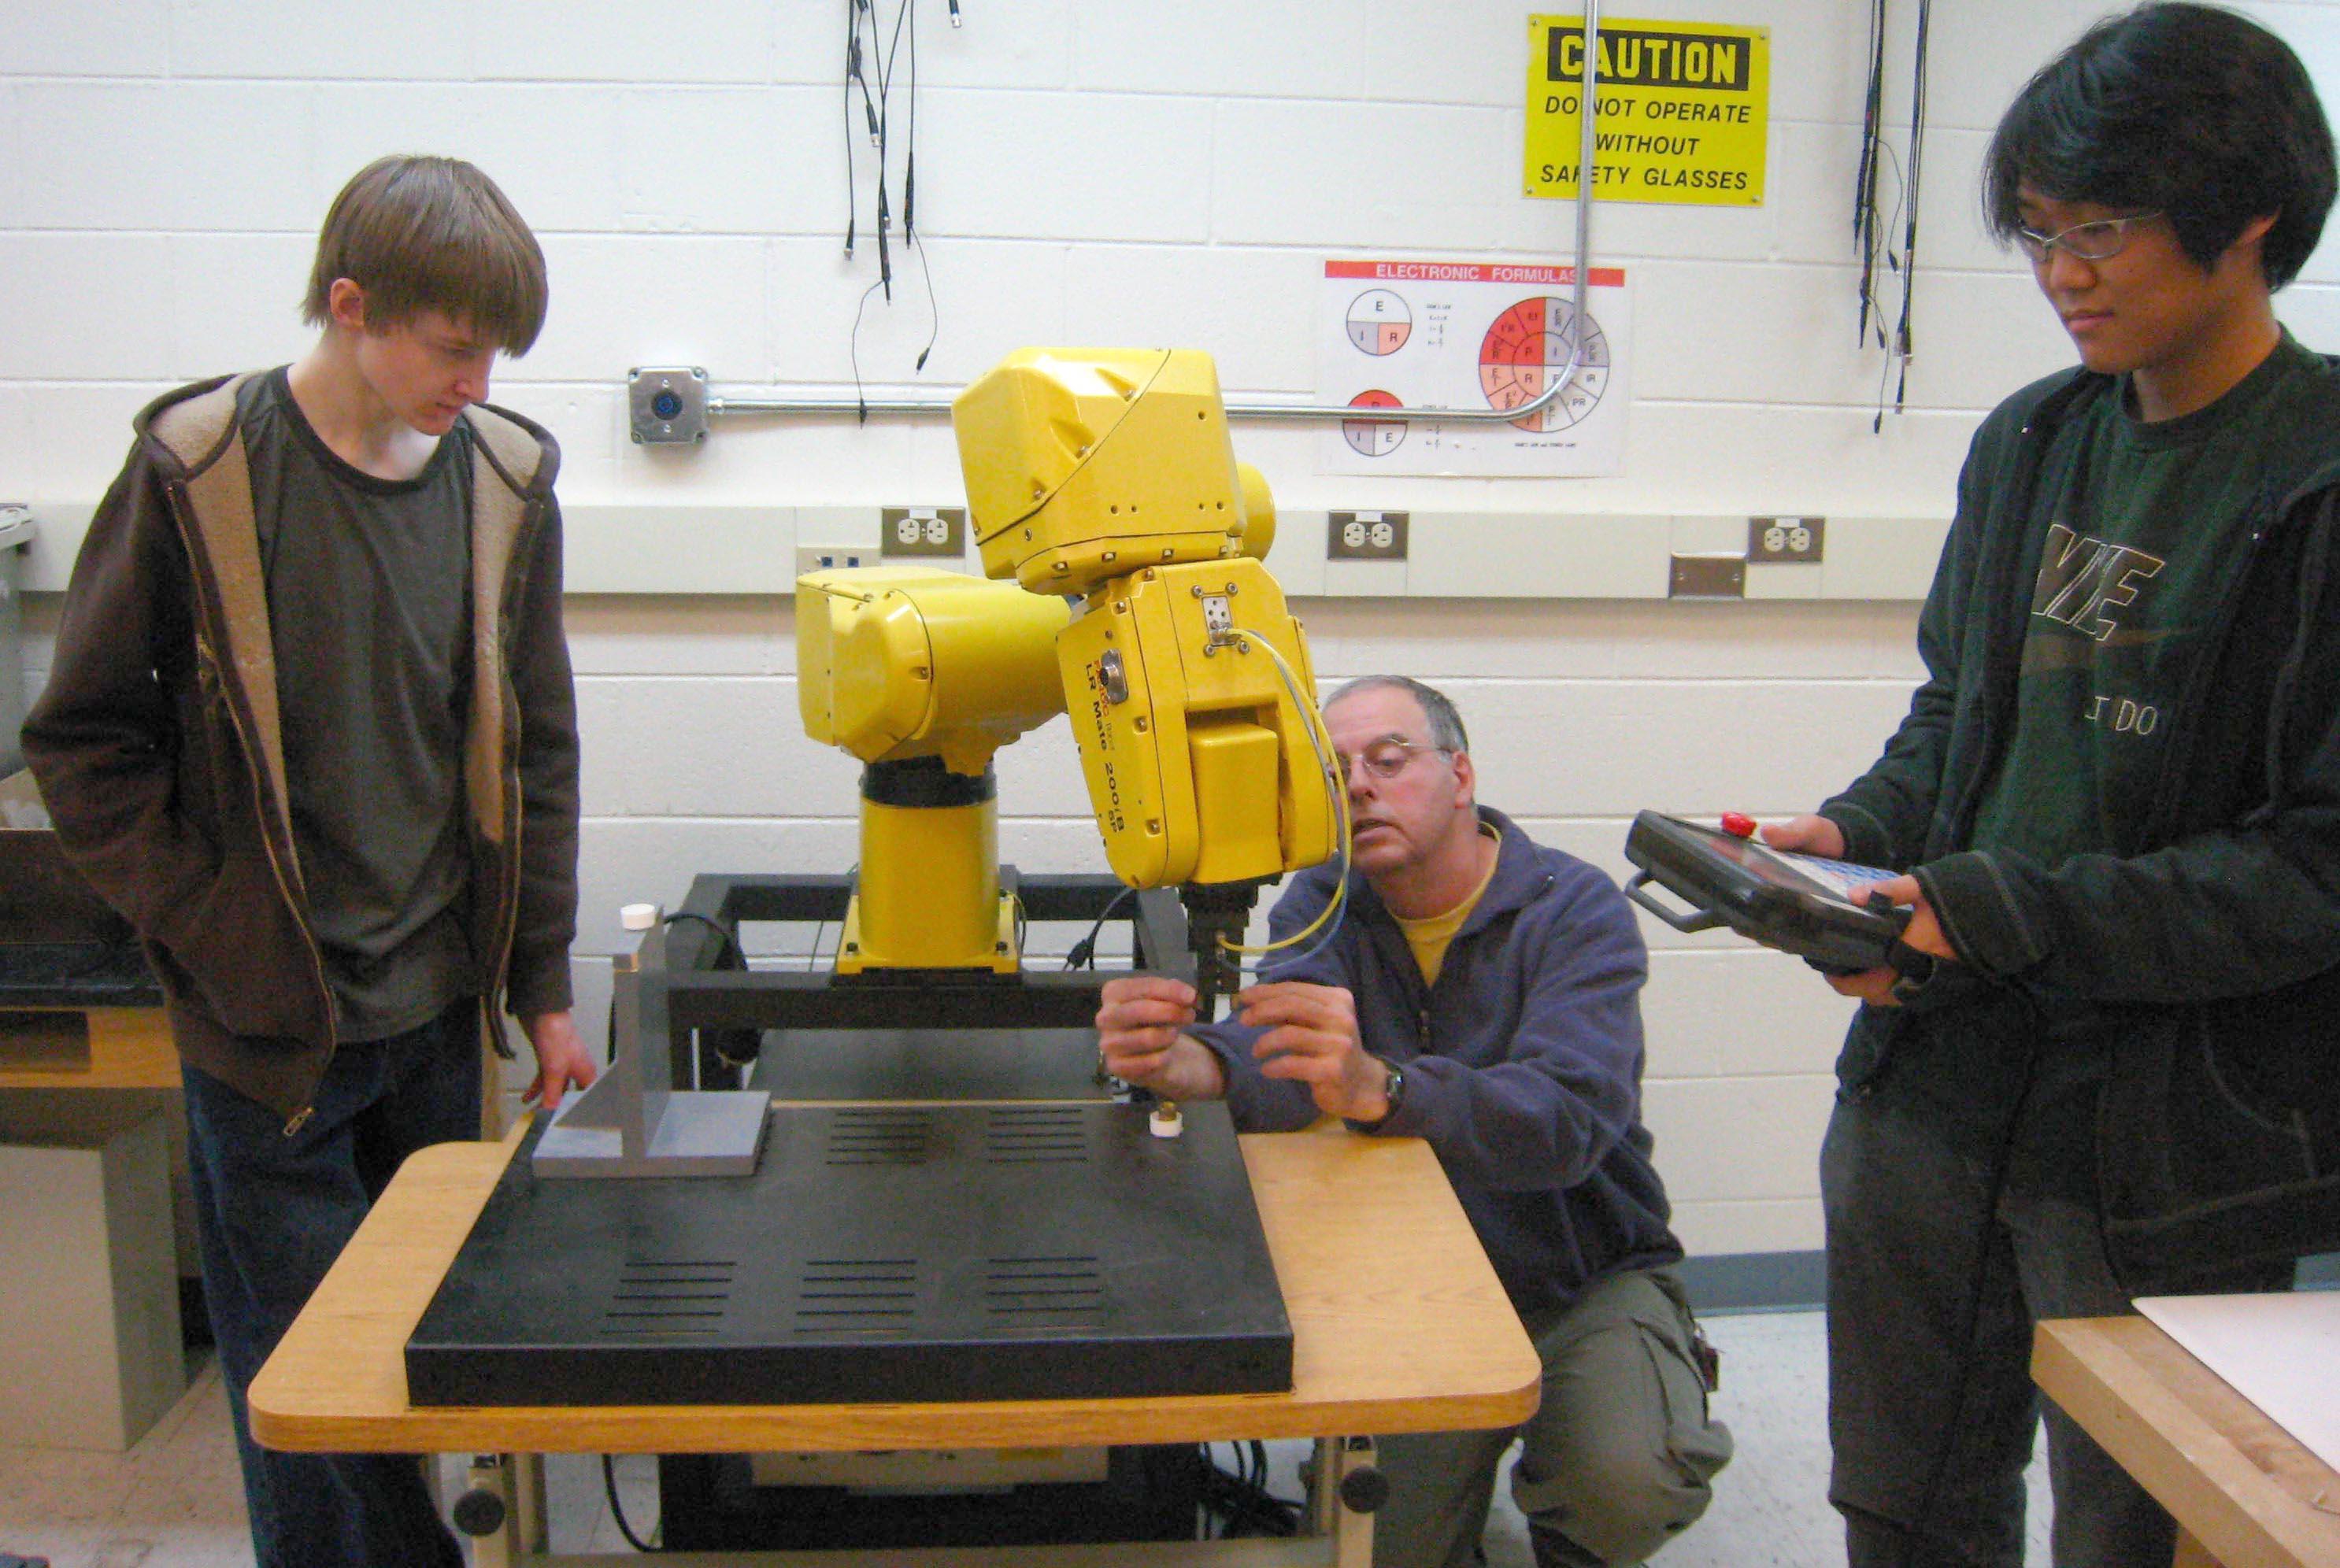 Robotics Case Studies - RobotWorx Industrial Robo